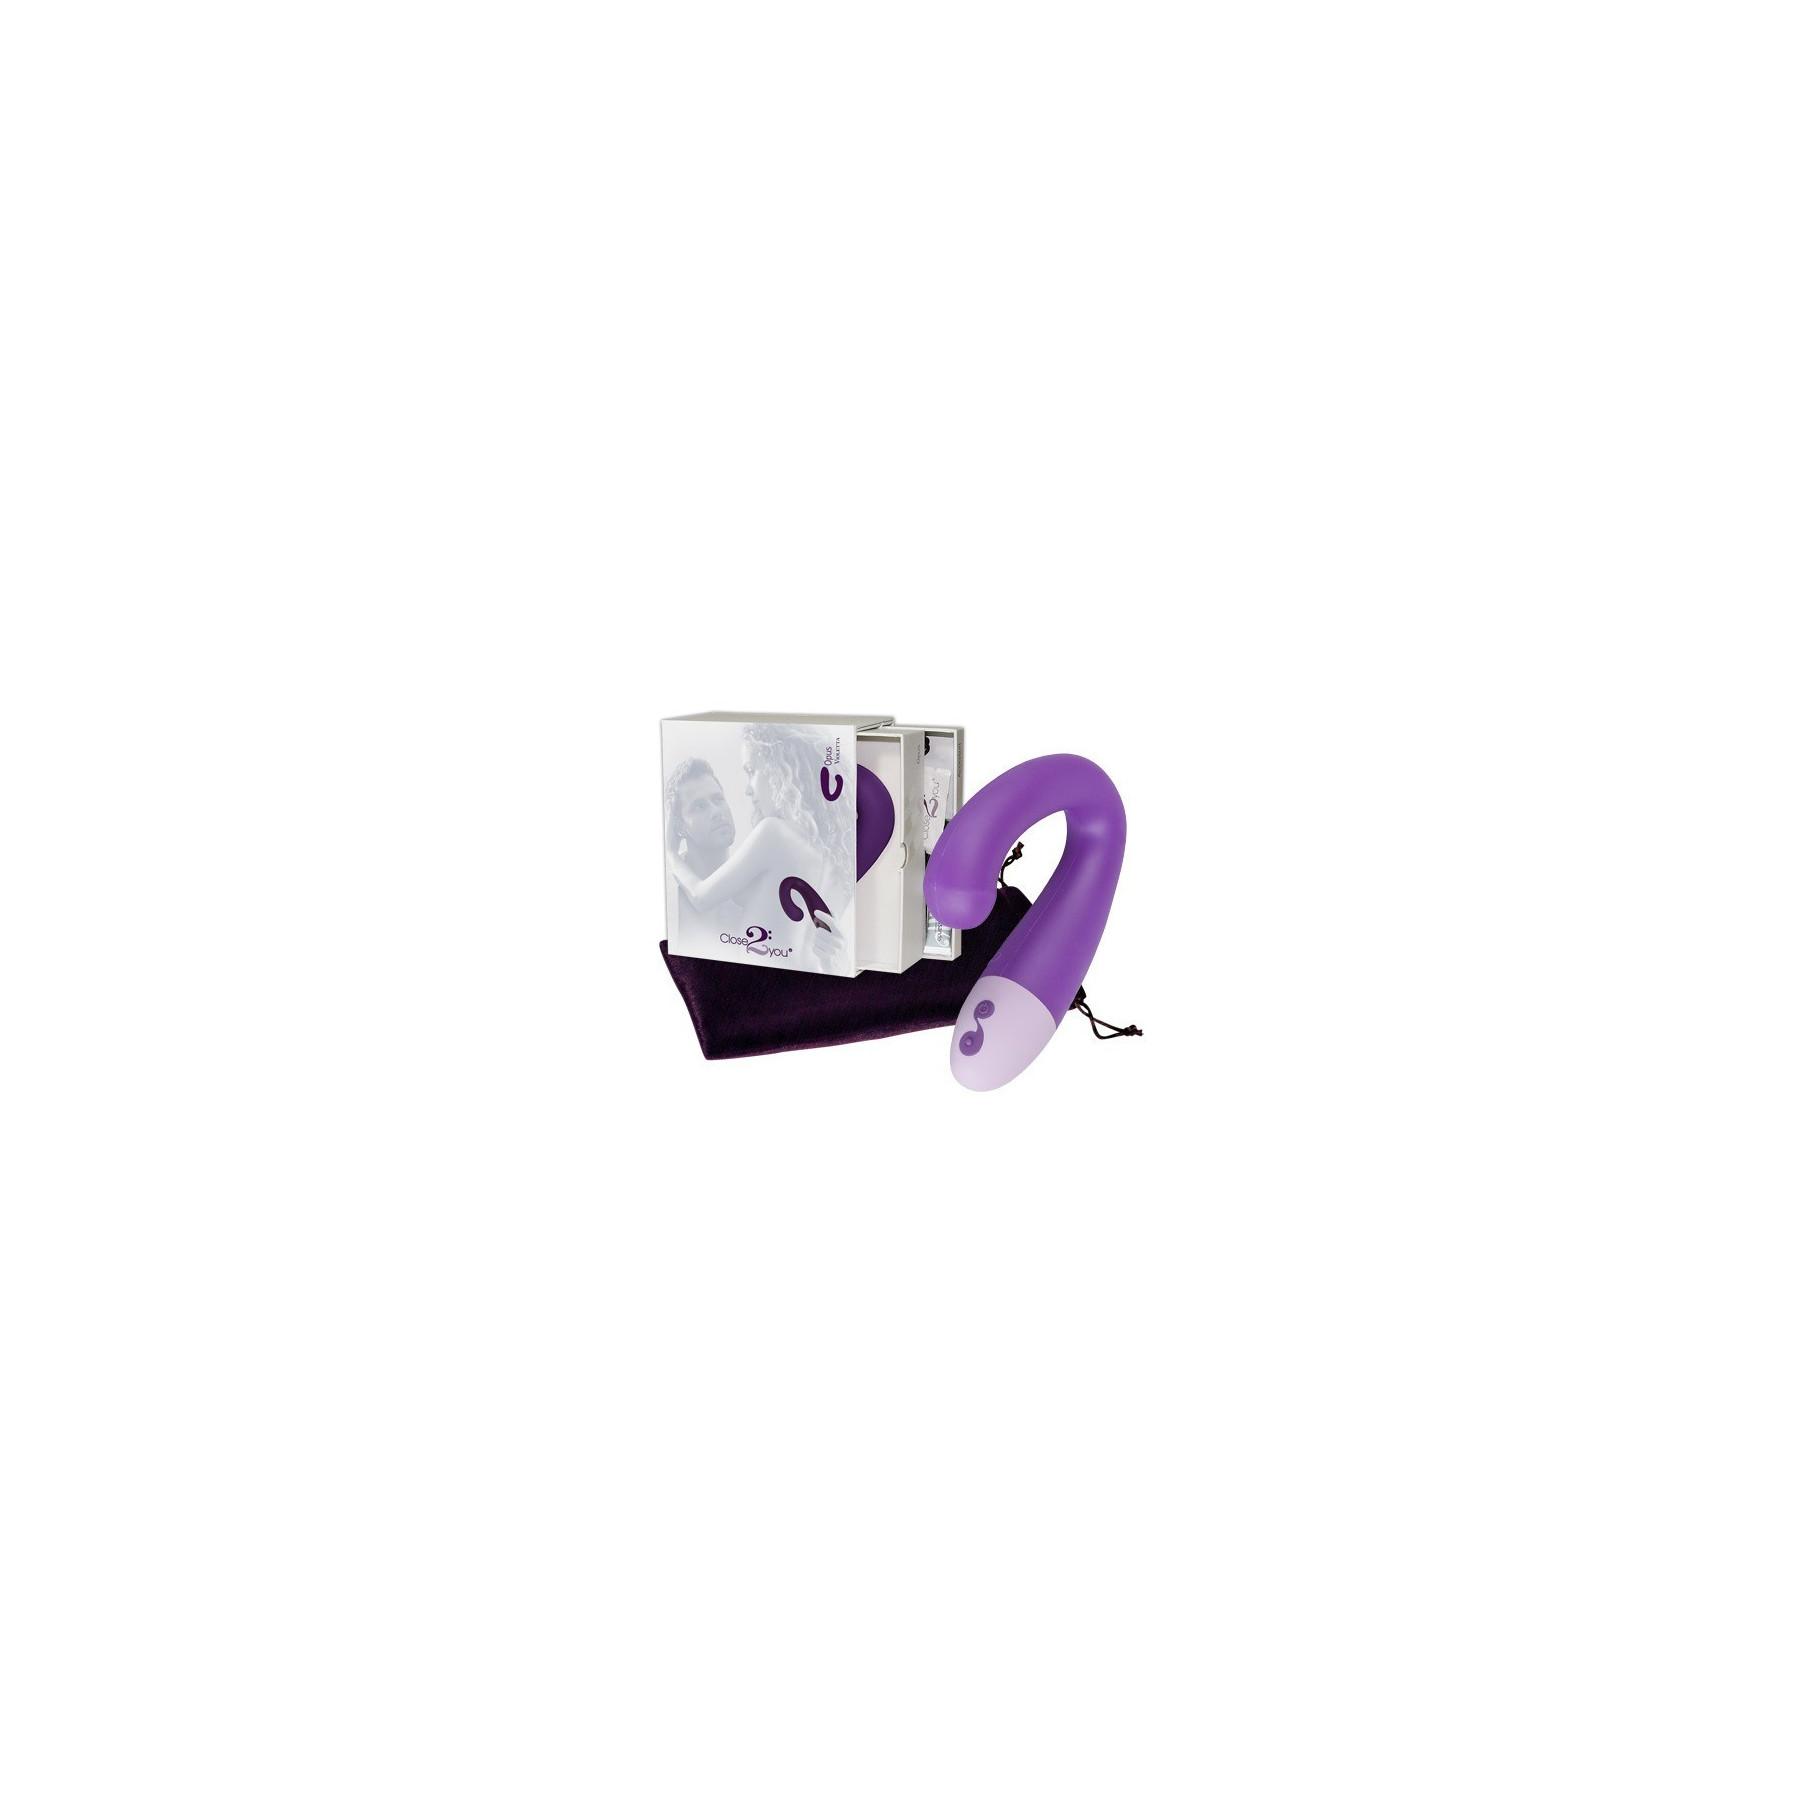 Vibratore OPUS Violetta Sex Toy punto G